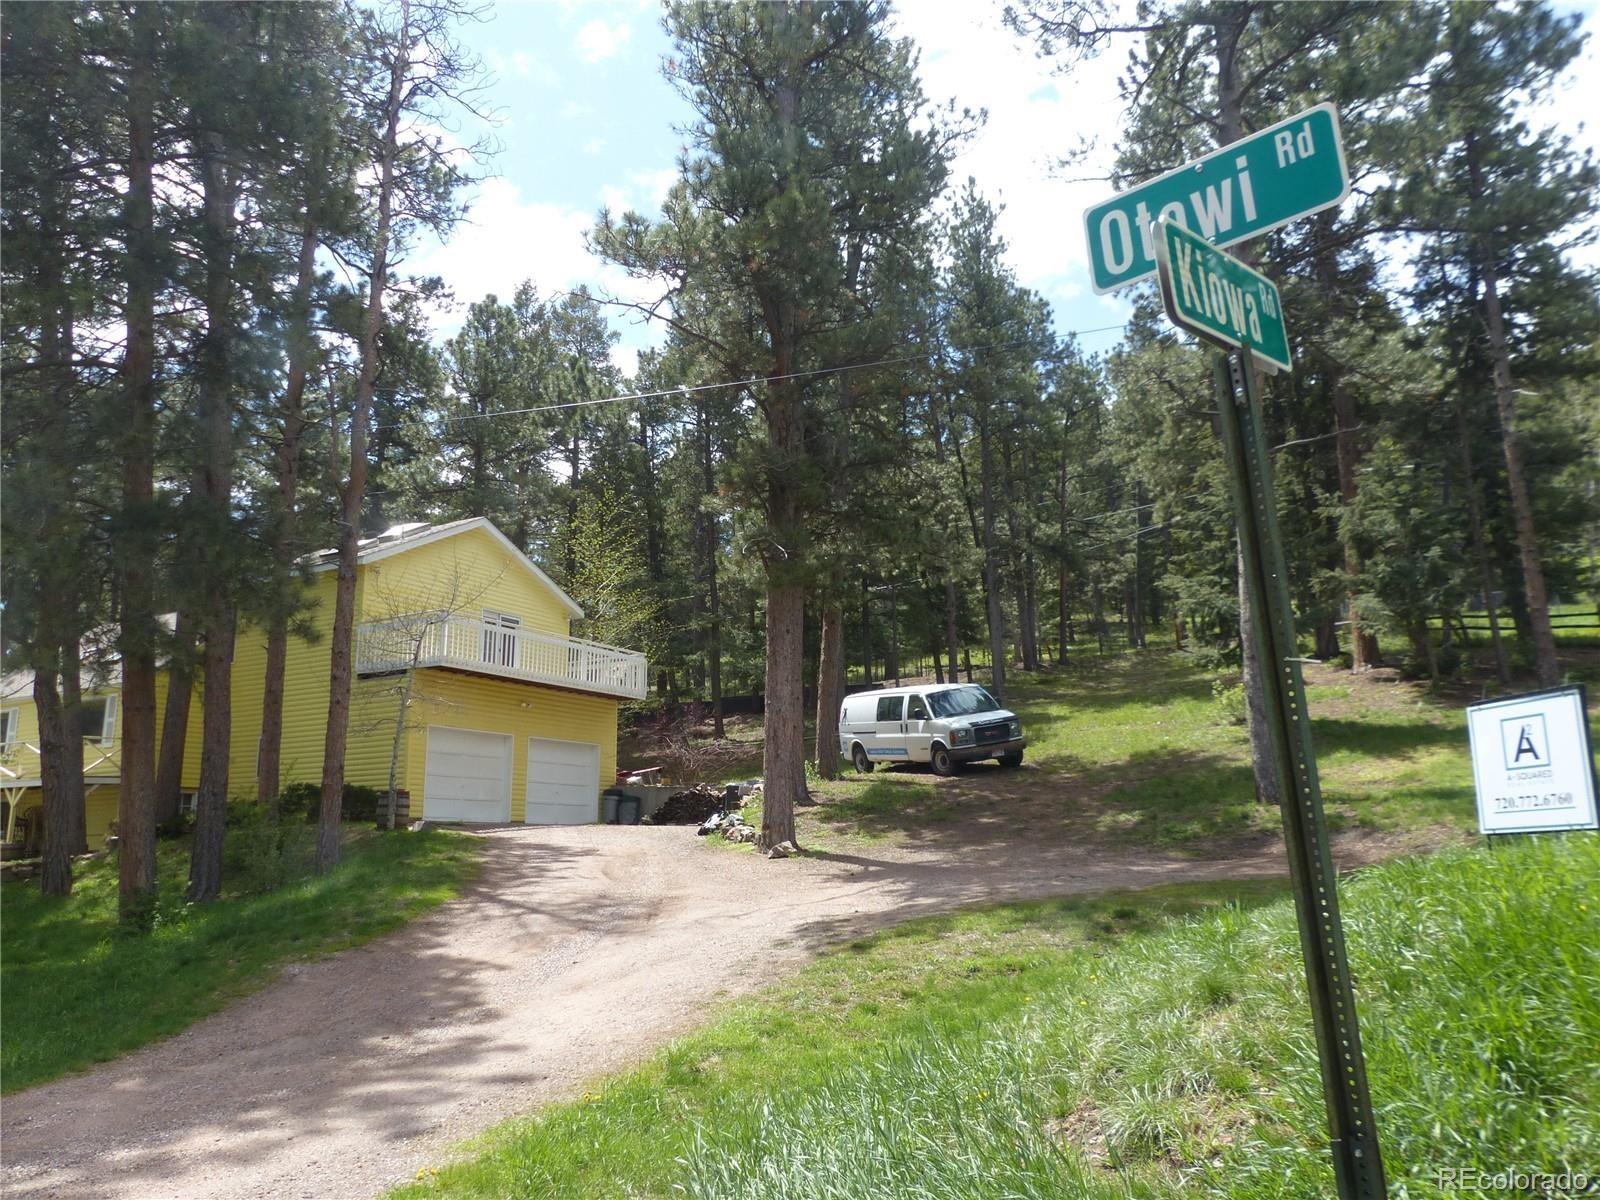 MLS# 4457487 - 18 - 23194 Otowi Road, Indian Hills, CO 80454